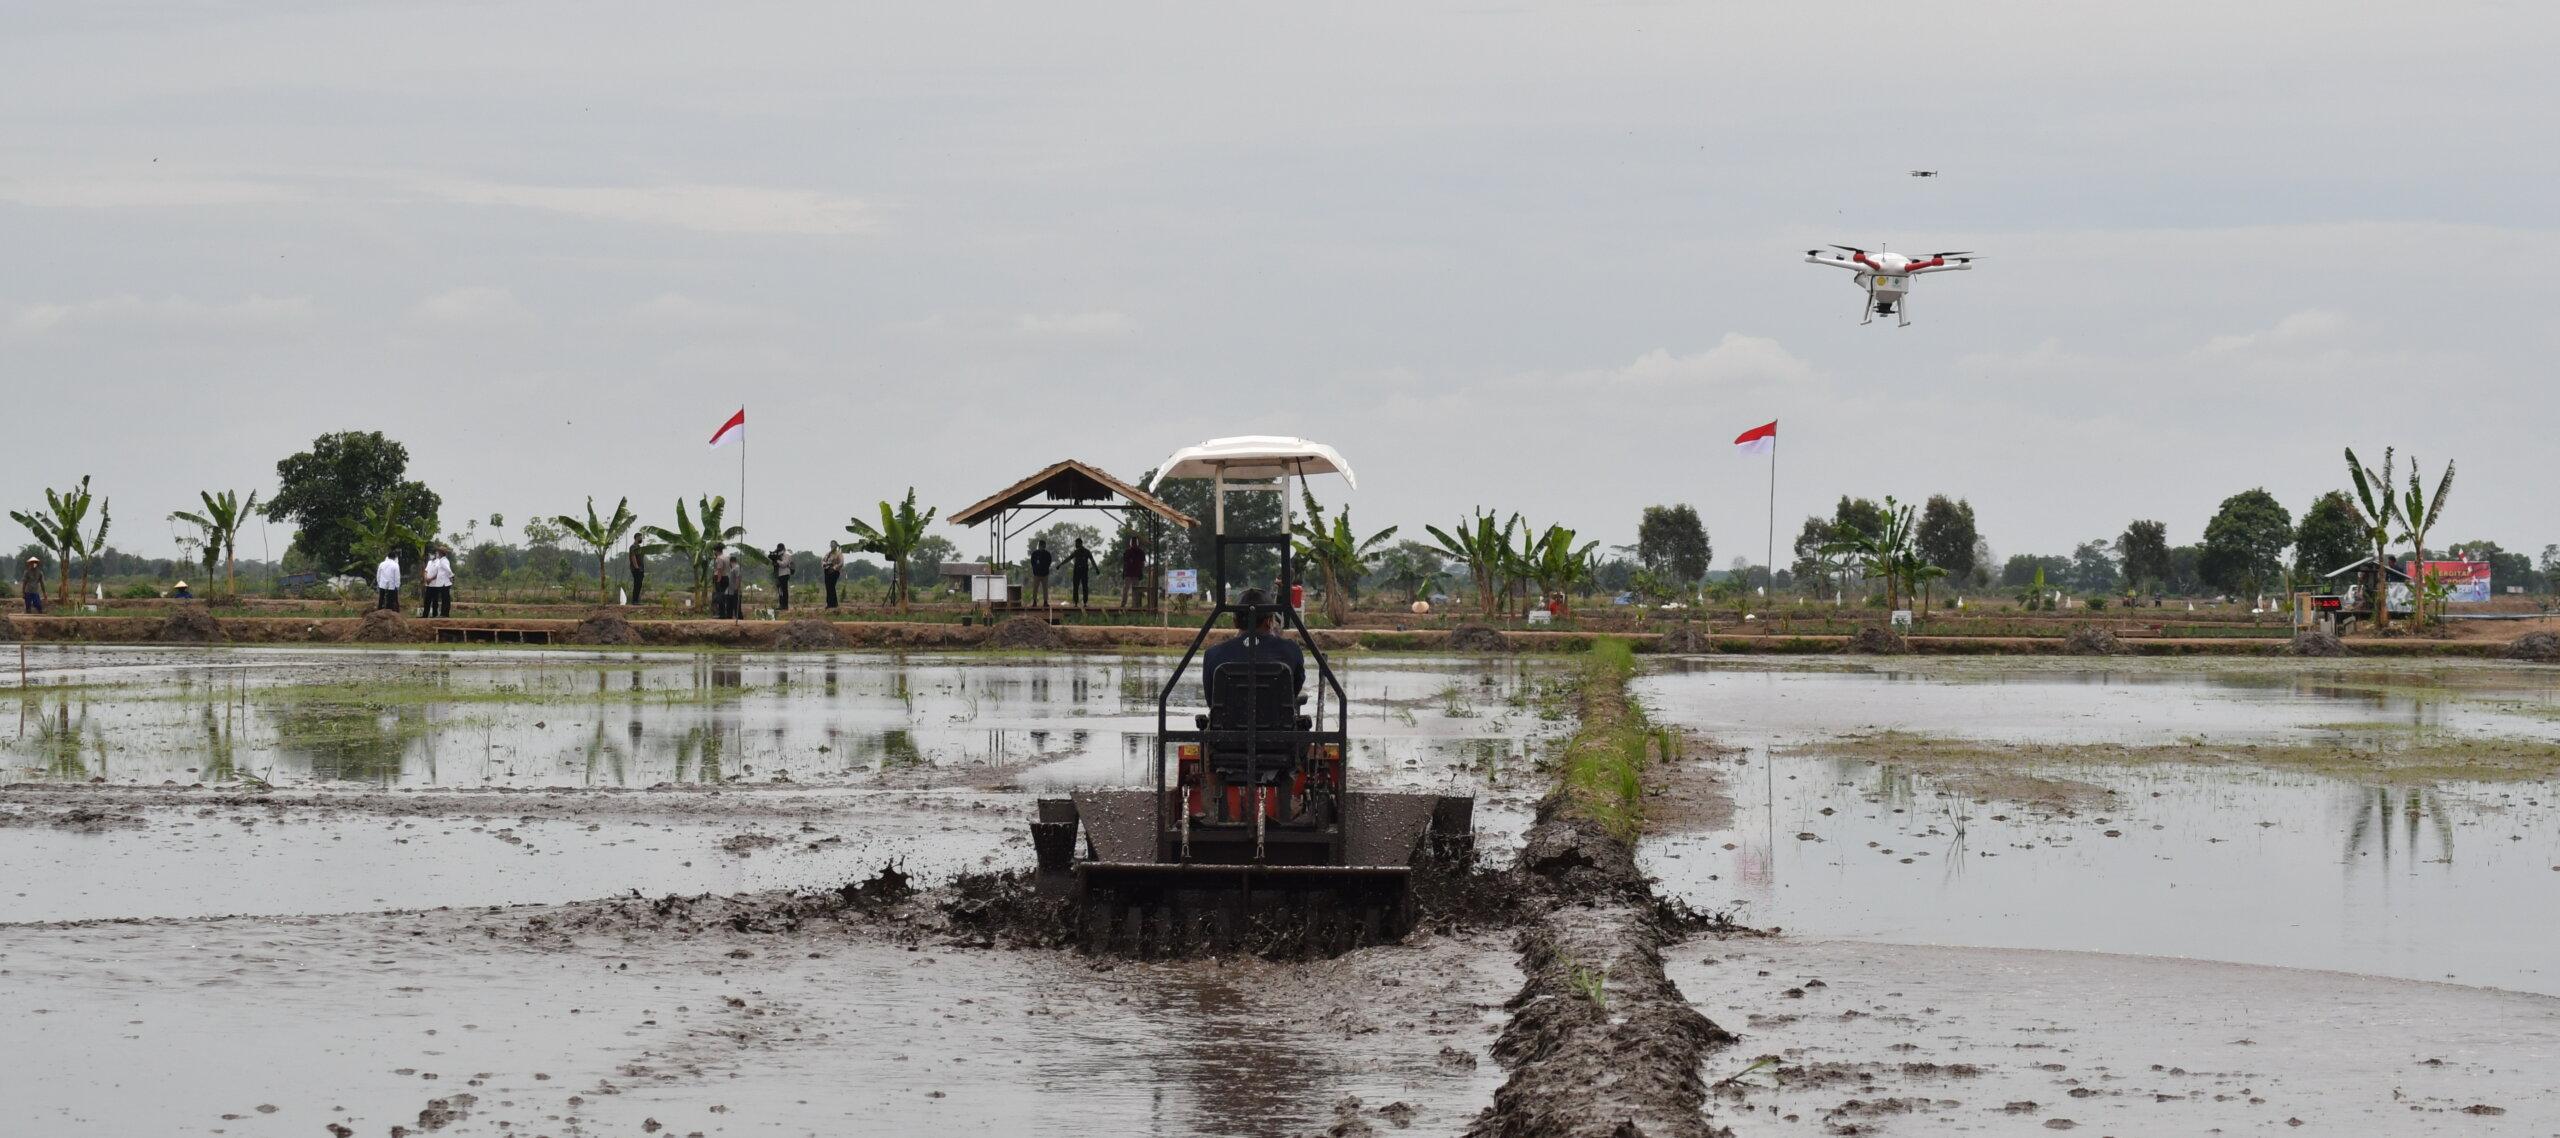 FOOD ESTATE: Hamparan sawah di kawasan food estate Desa Belanti Siam, Kecamatan Pandih Batu, Pulpis. Se bulan terakhir para petani setempat mengeluhkan tingginya harga pupuk bersubsidi.